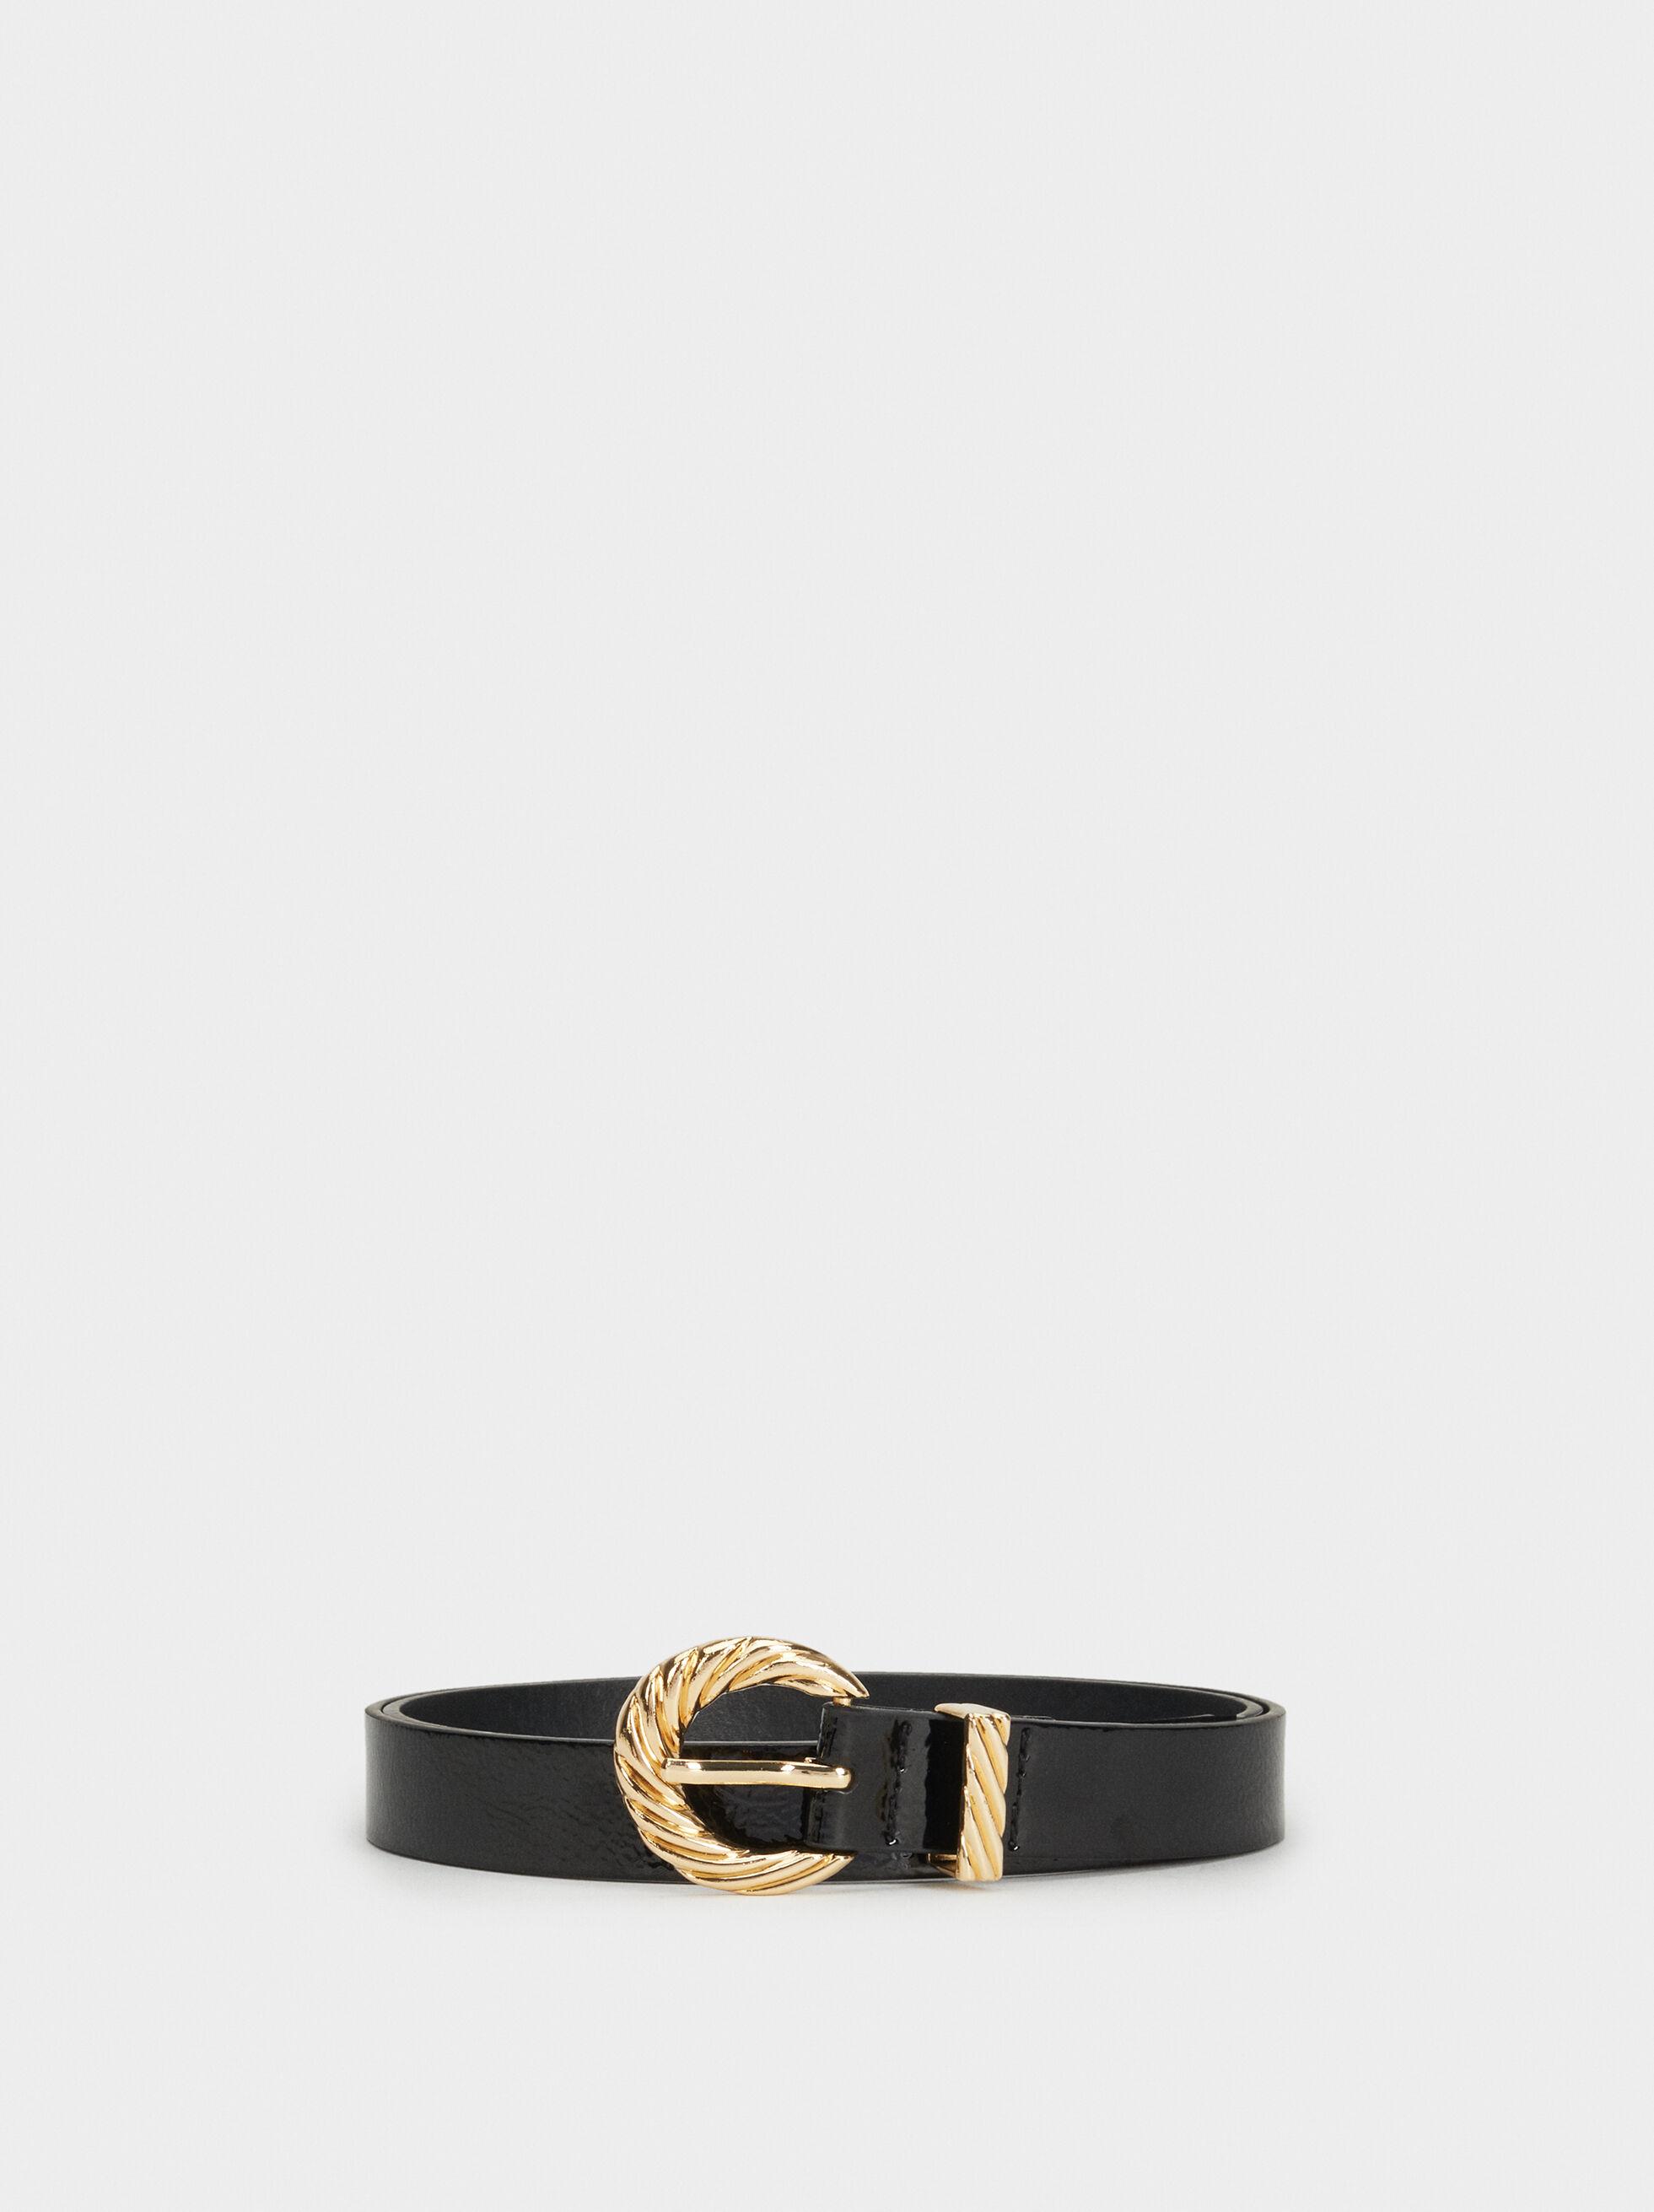 Cintura Con Fibbia Dorata, Nero, hi-res